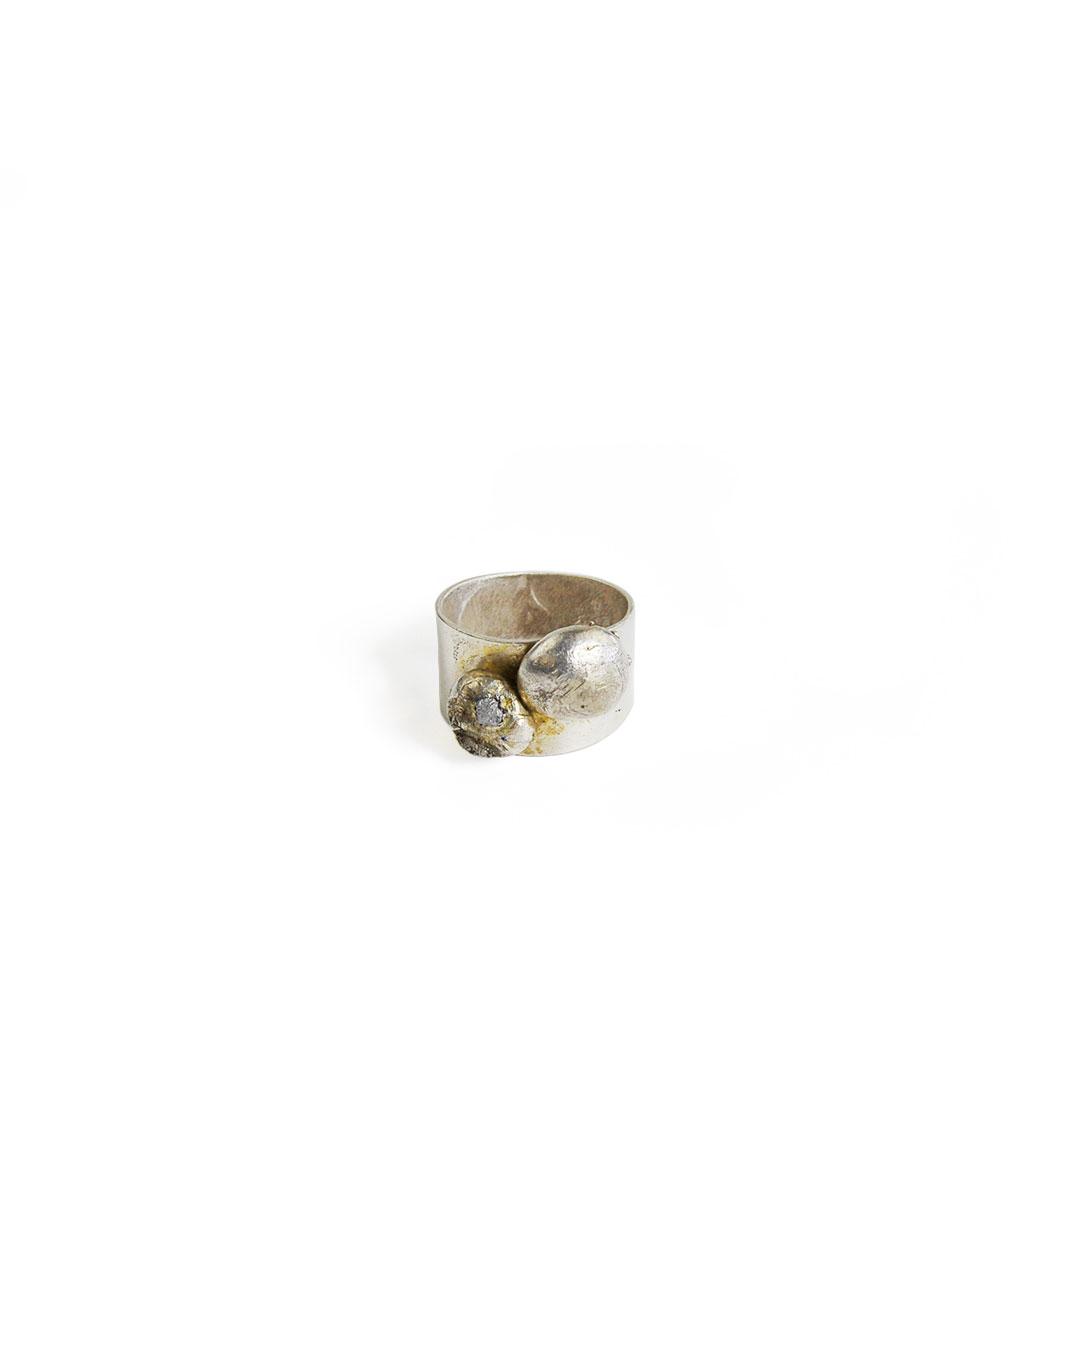 Rudolf Kocéa, untitled, 2014, ring; silver copper alloy, uncut diamonds, ø 19 x 12 mm, €680